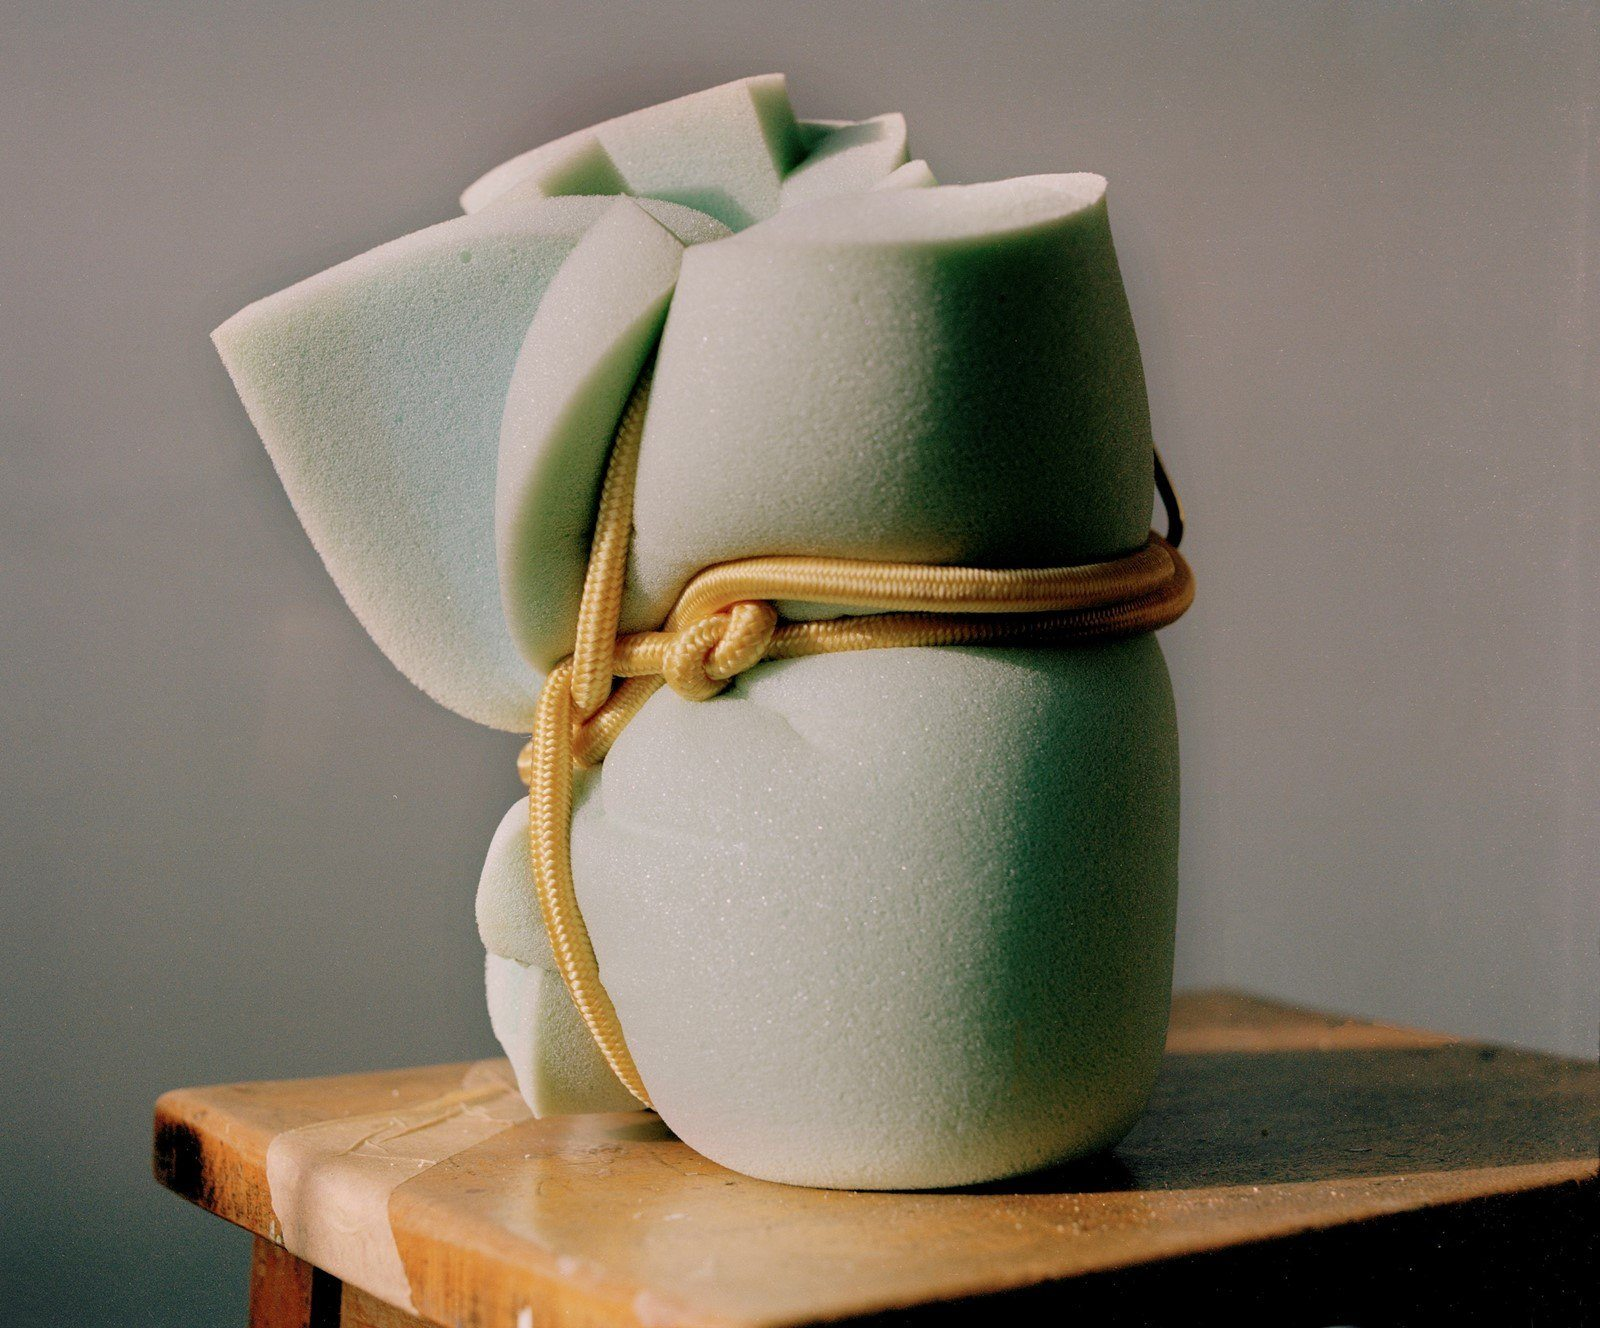 IGNANT-Art-Tine-Bek-Komfort-Skulptur-8